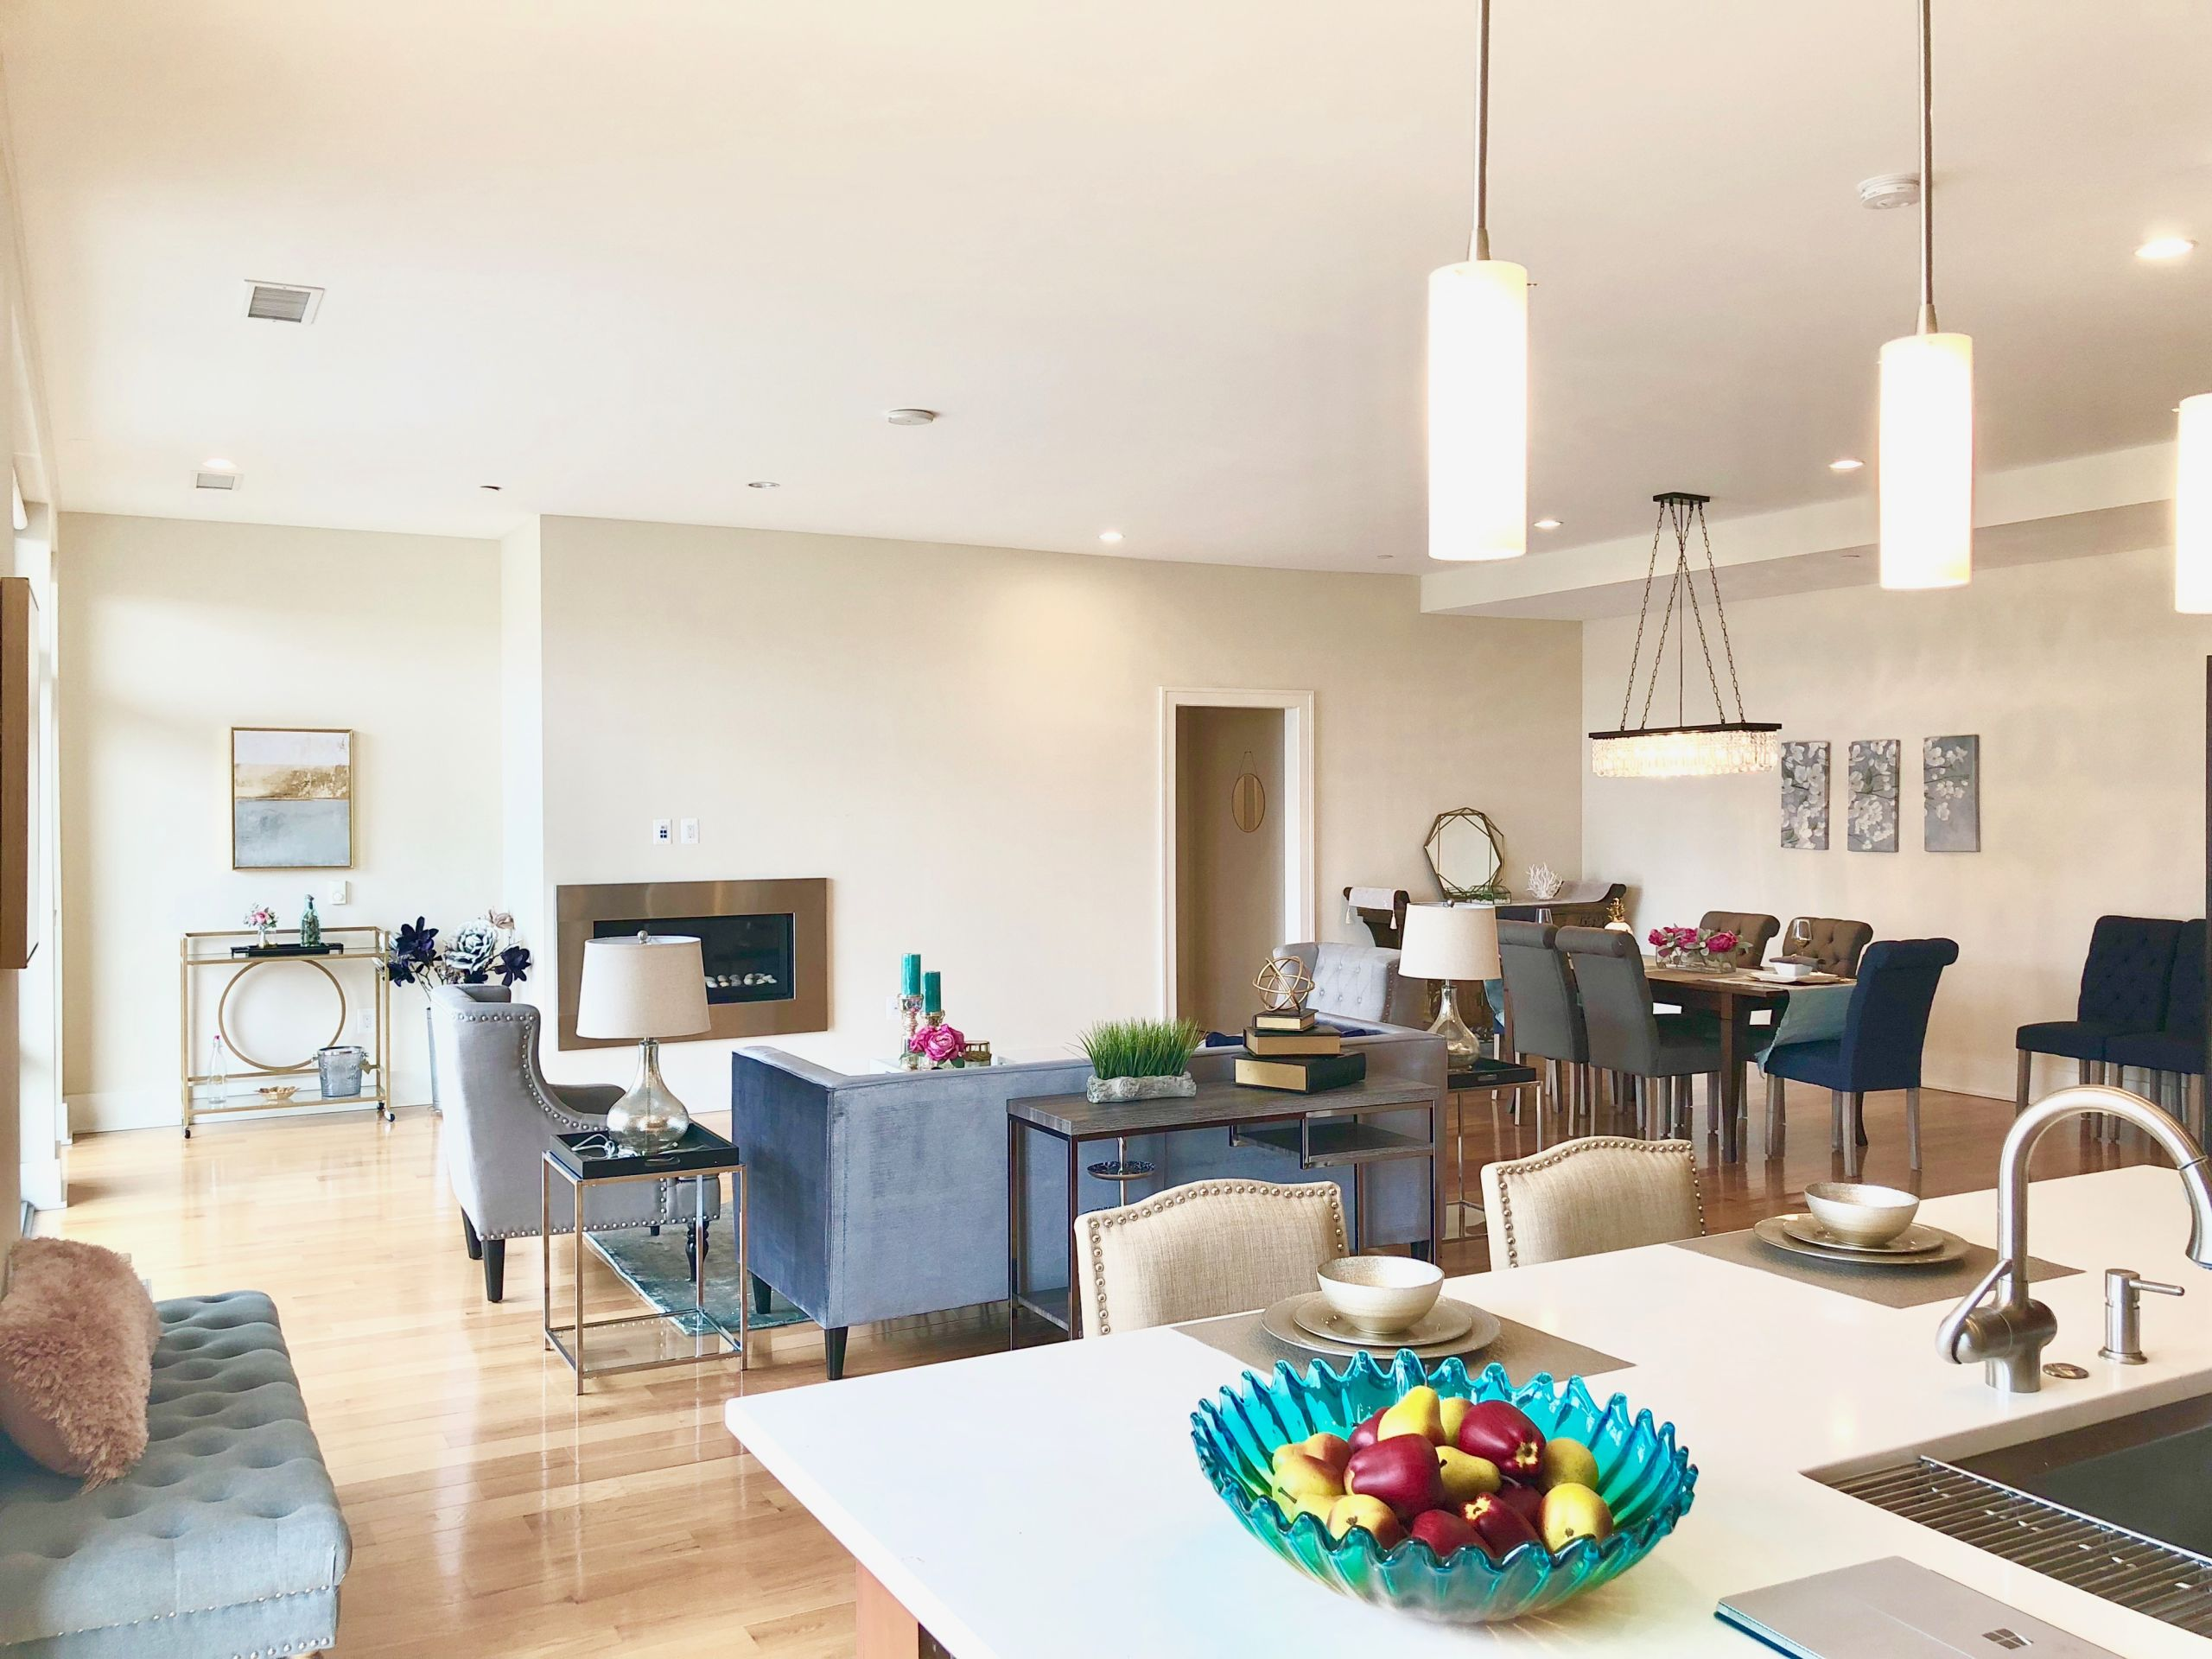 Under Contract Waterfront Luxury Condo Alexandria Va Click For More Details